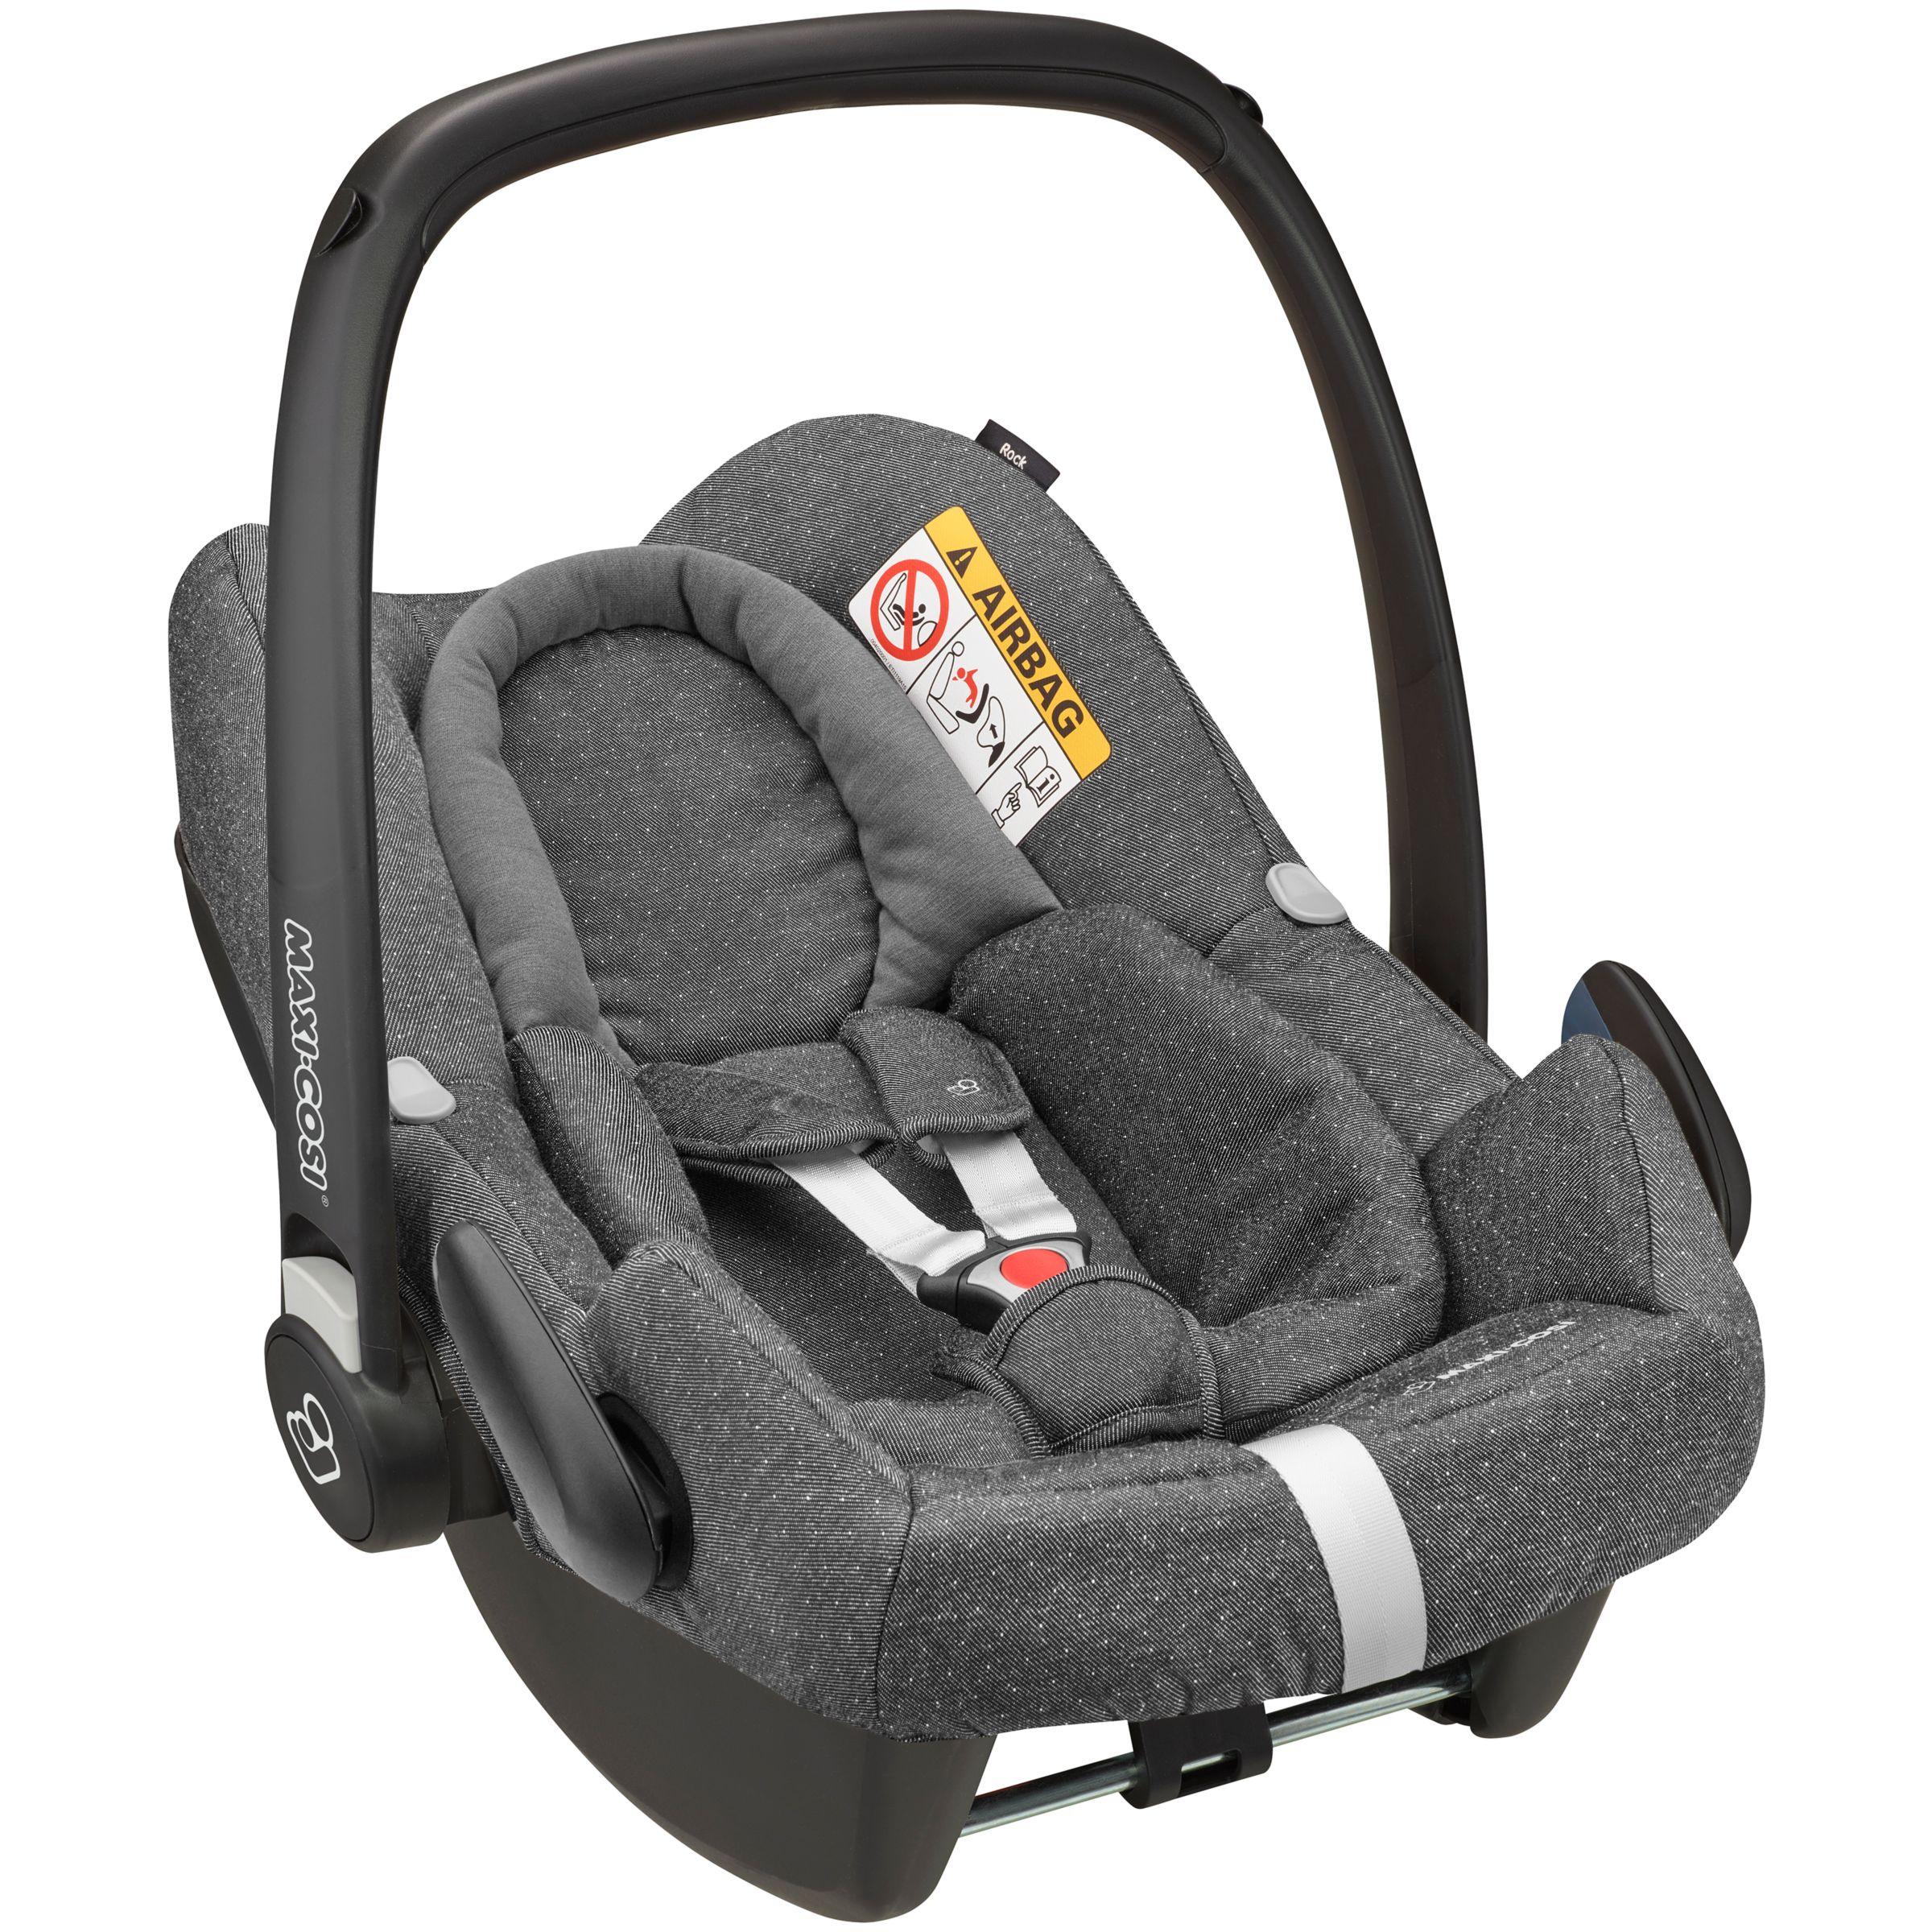 Maxi-Cosi Rock Group 0+ Baby Car Seat